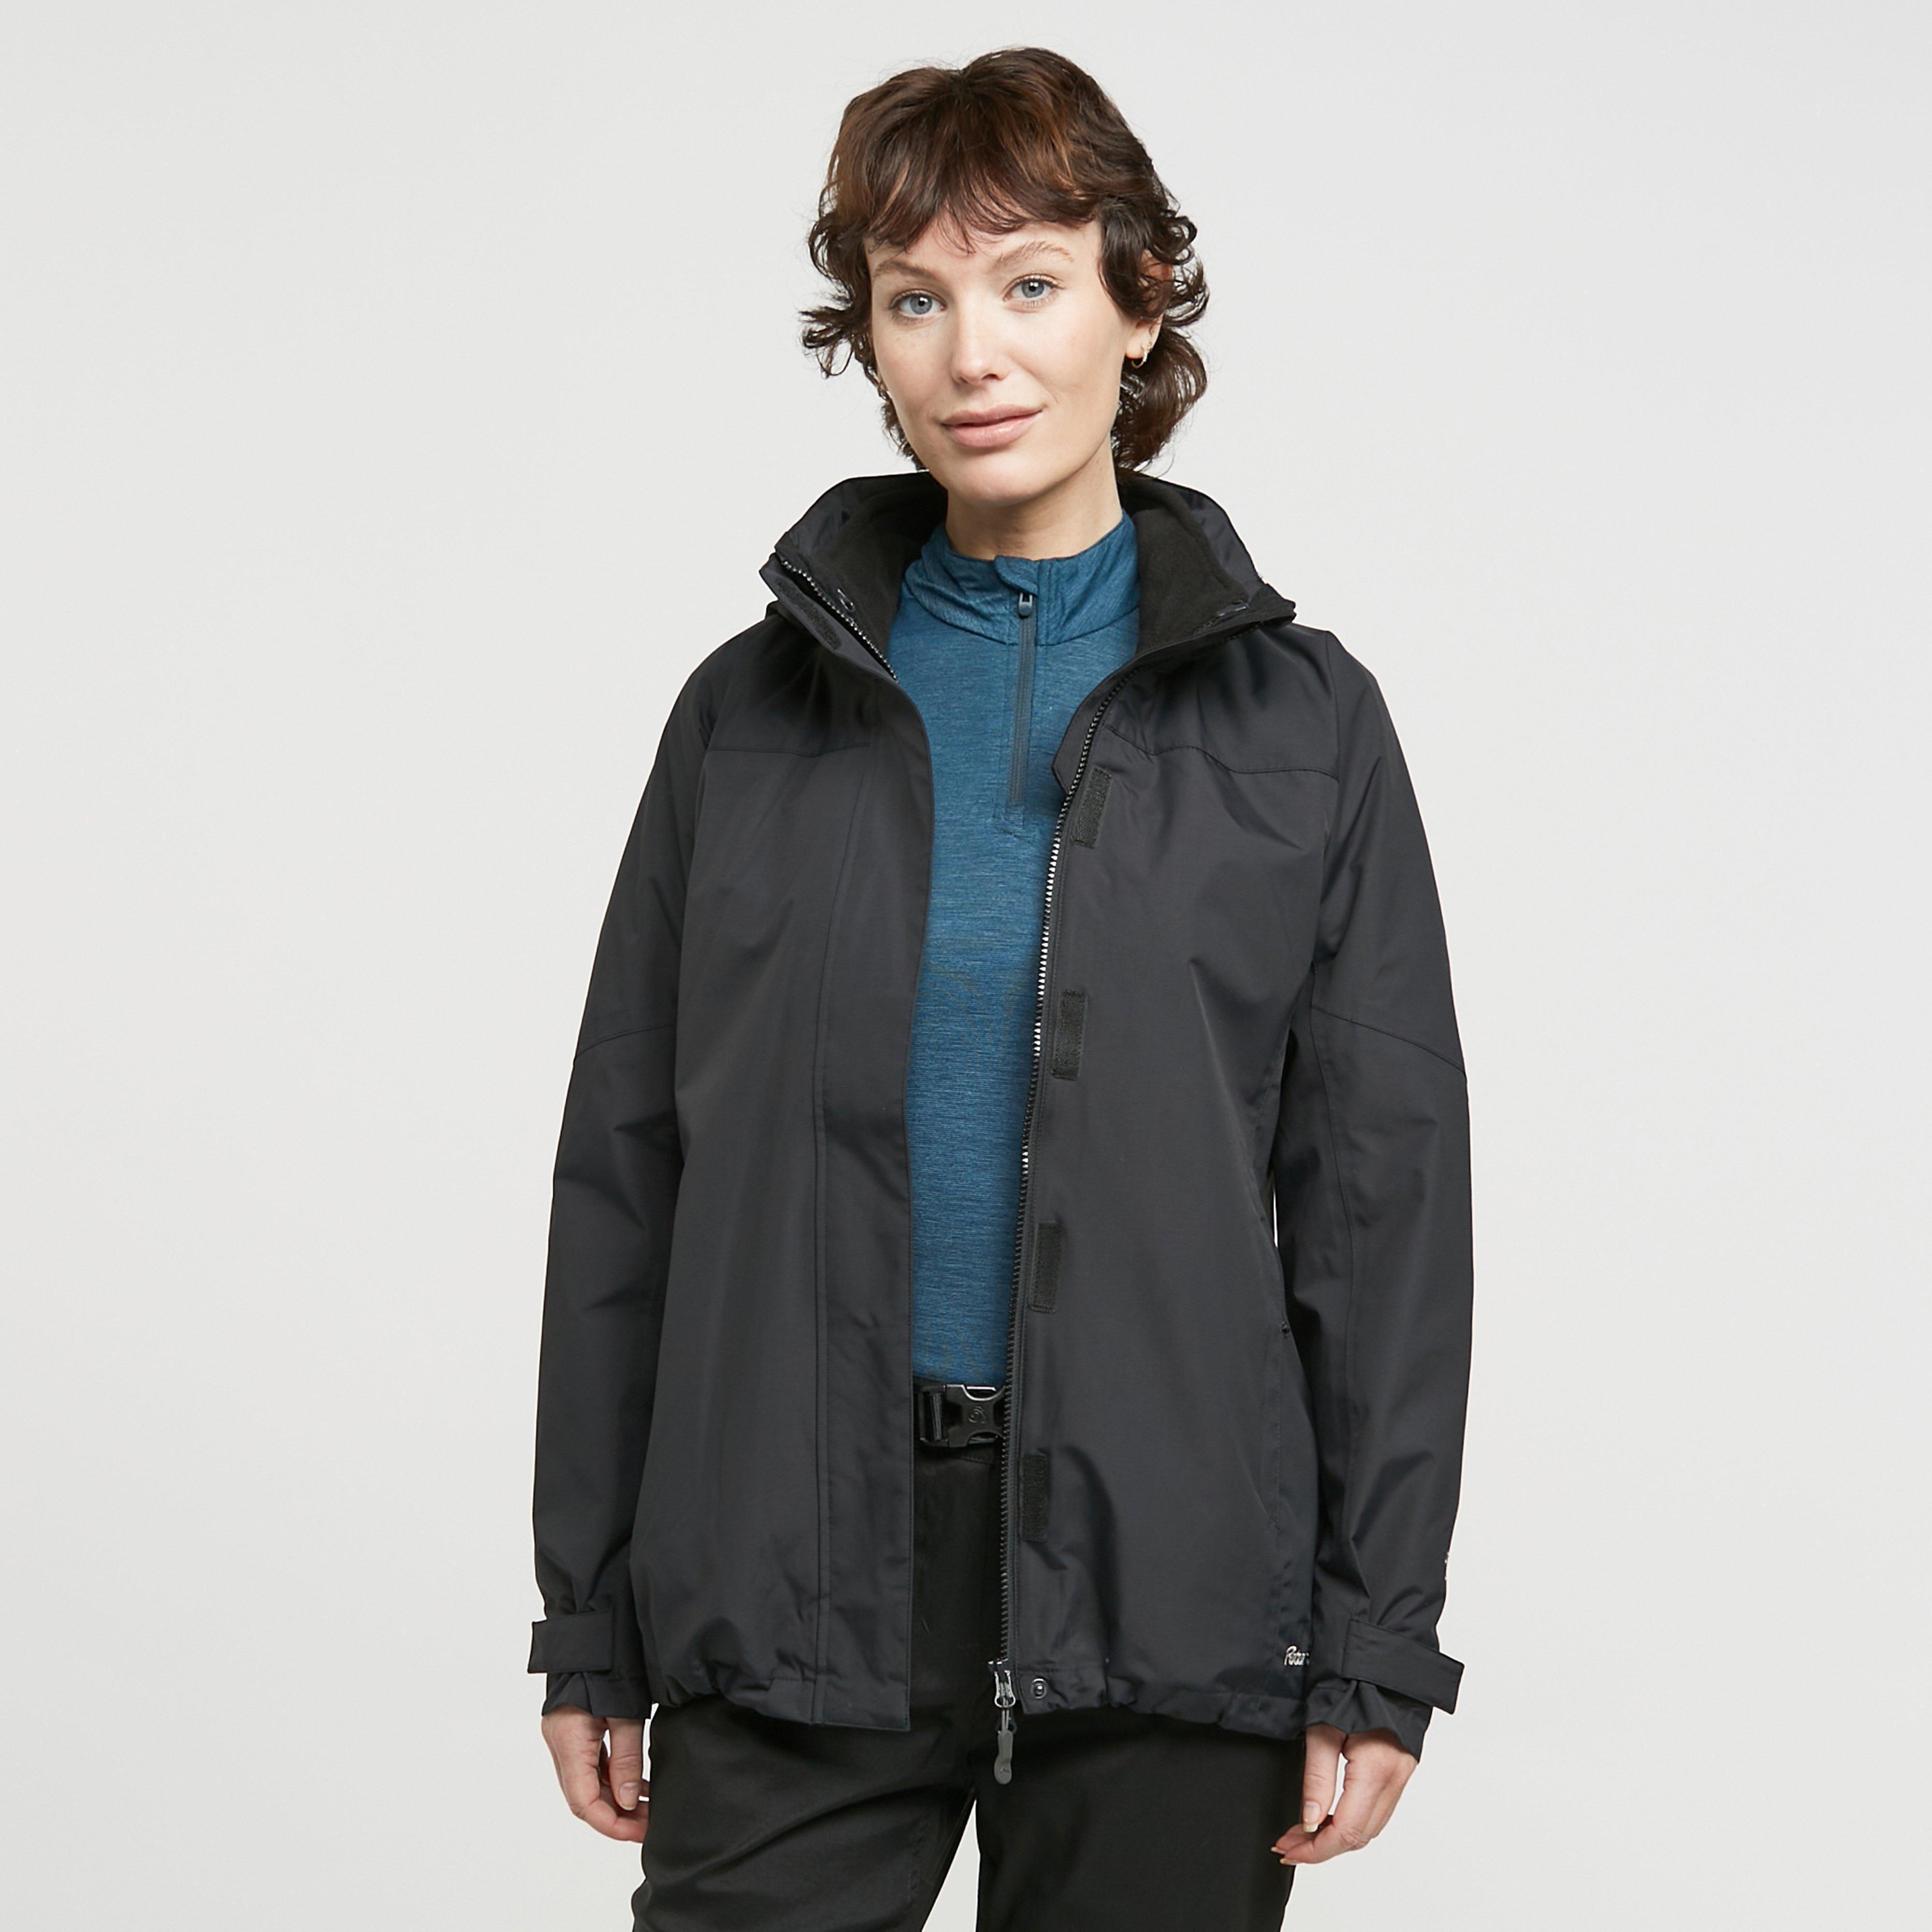 Peter Storm Women's Lakeside 3 In 1 Jacket - Black, Black